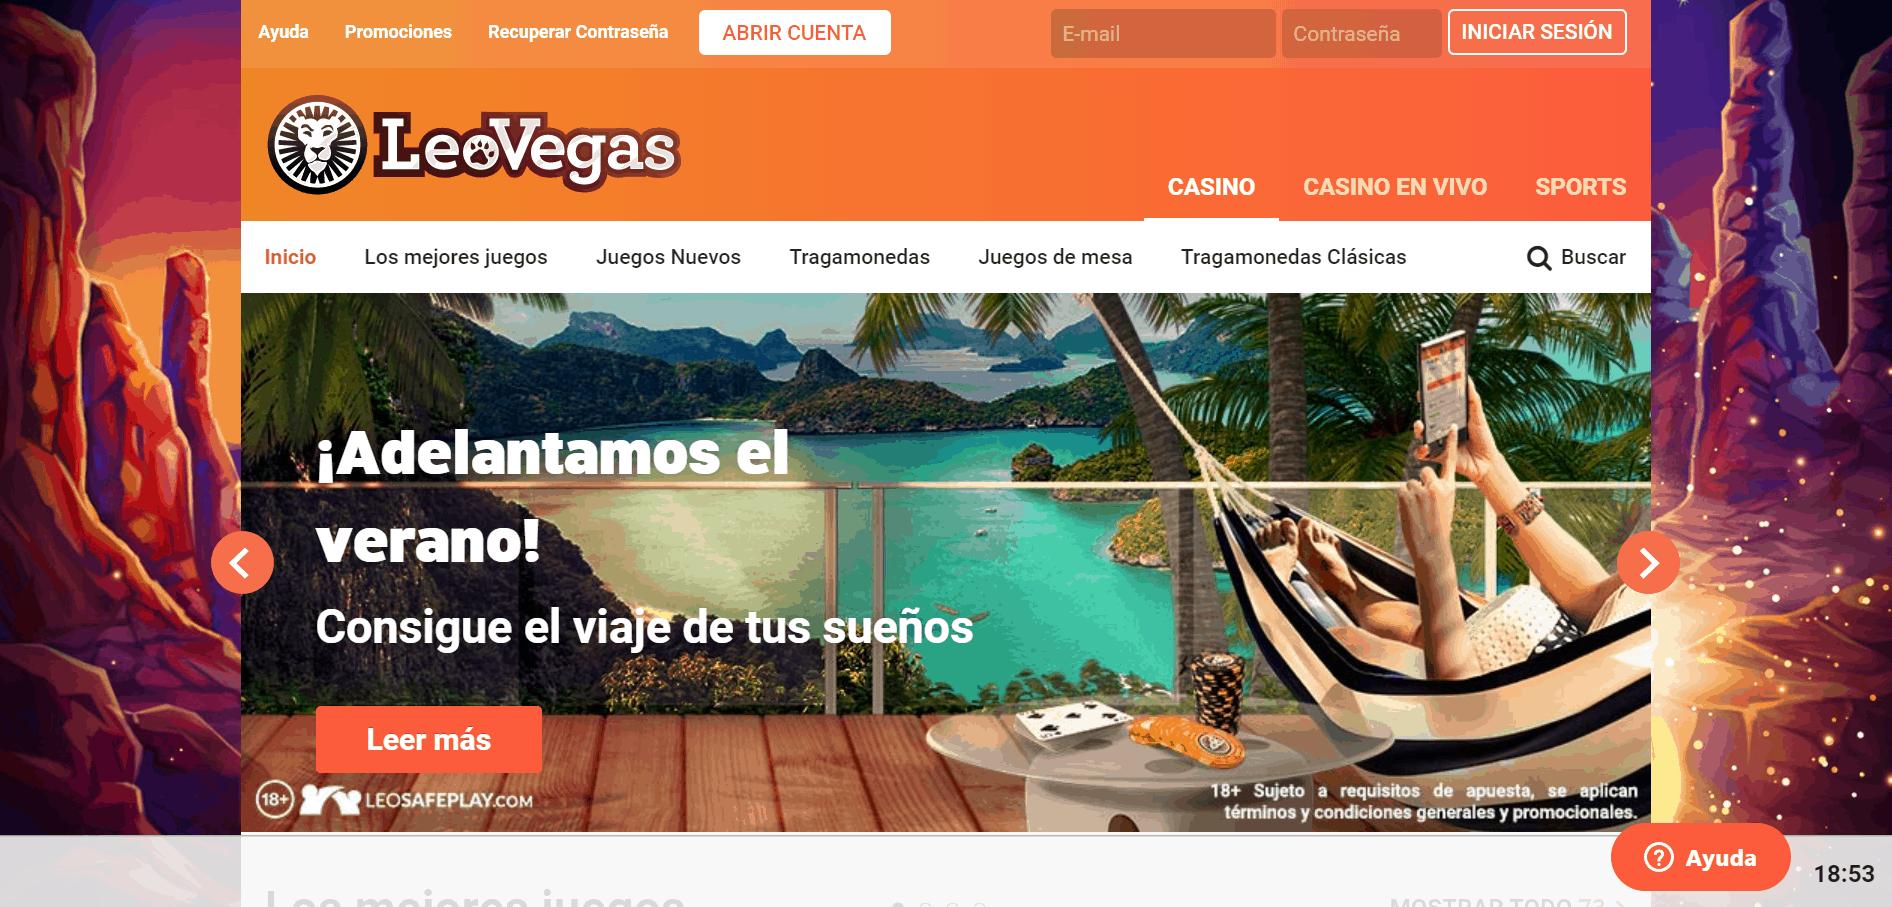 Leovegas Chile desktop